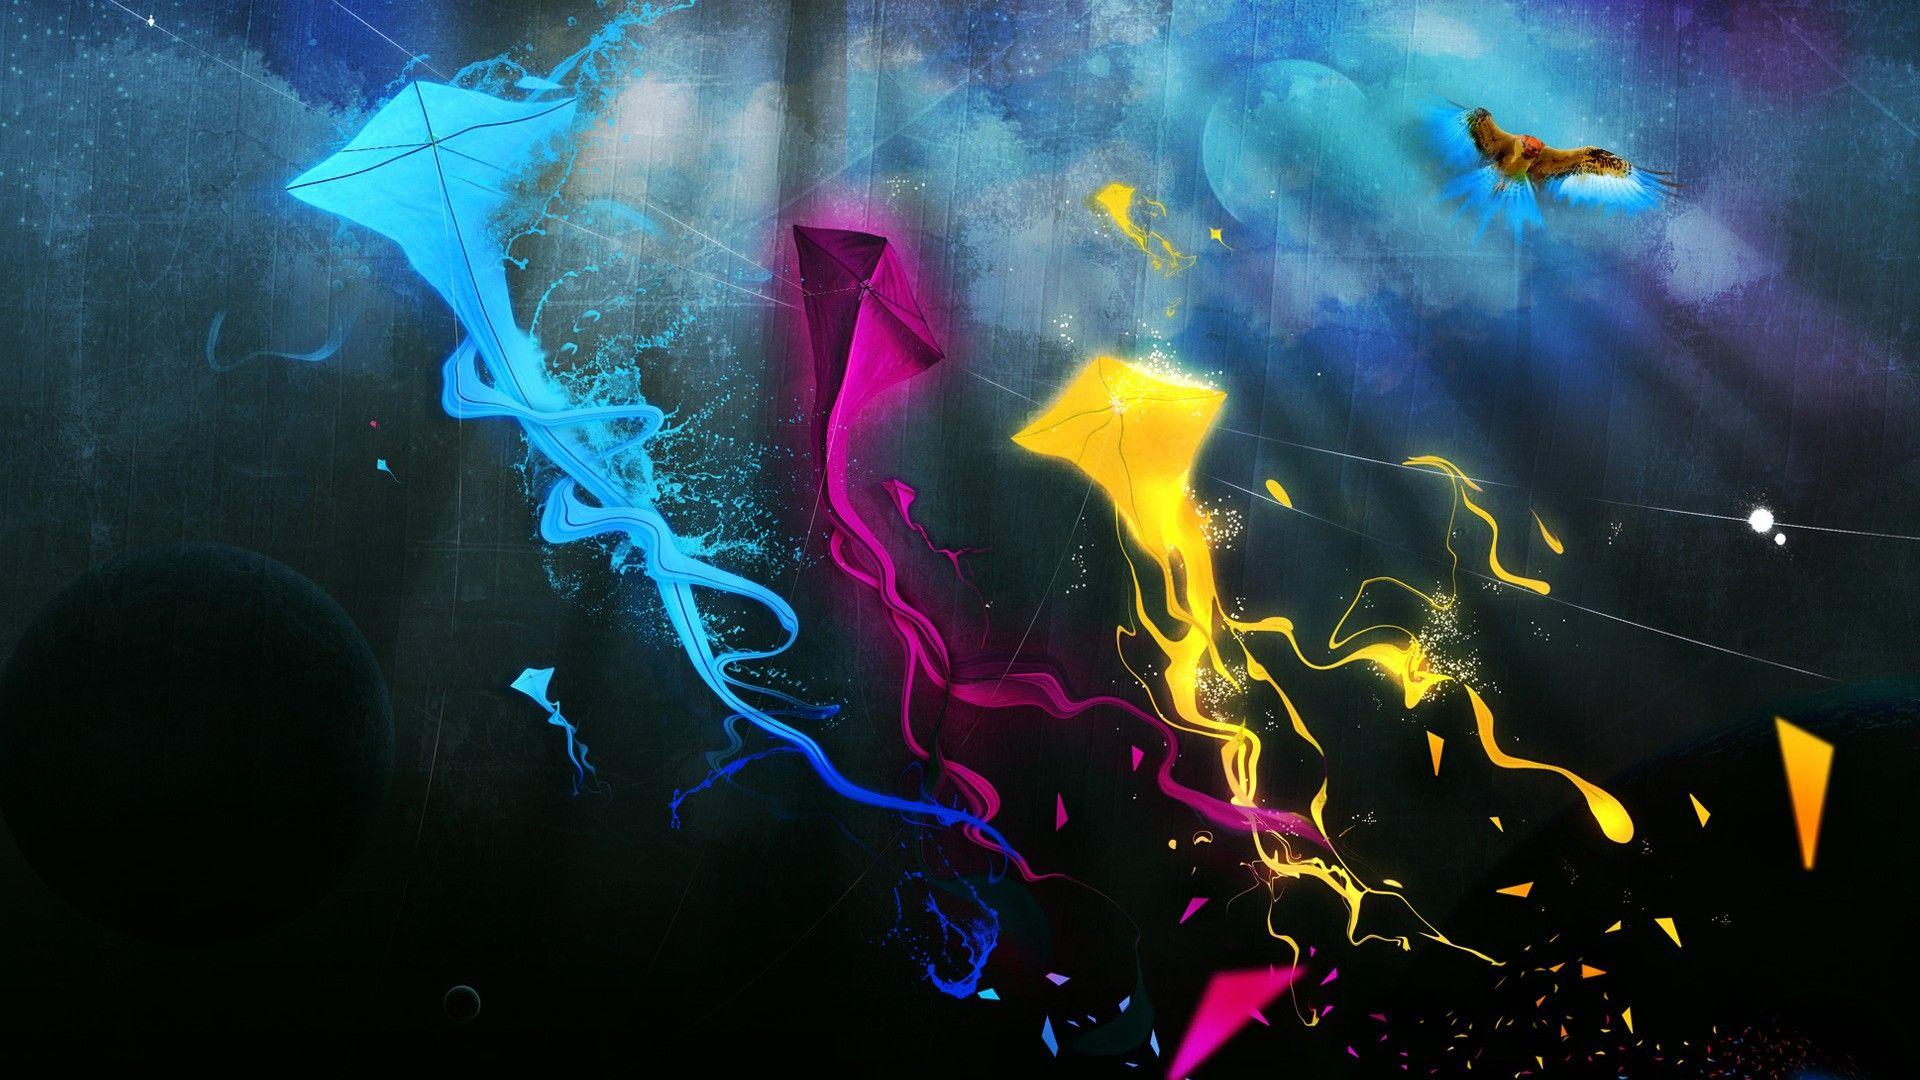 17 Best ideas about Wallpaper Hd Free on Pinterest   Hd wallpapers ...